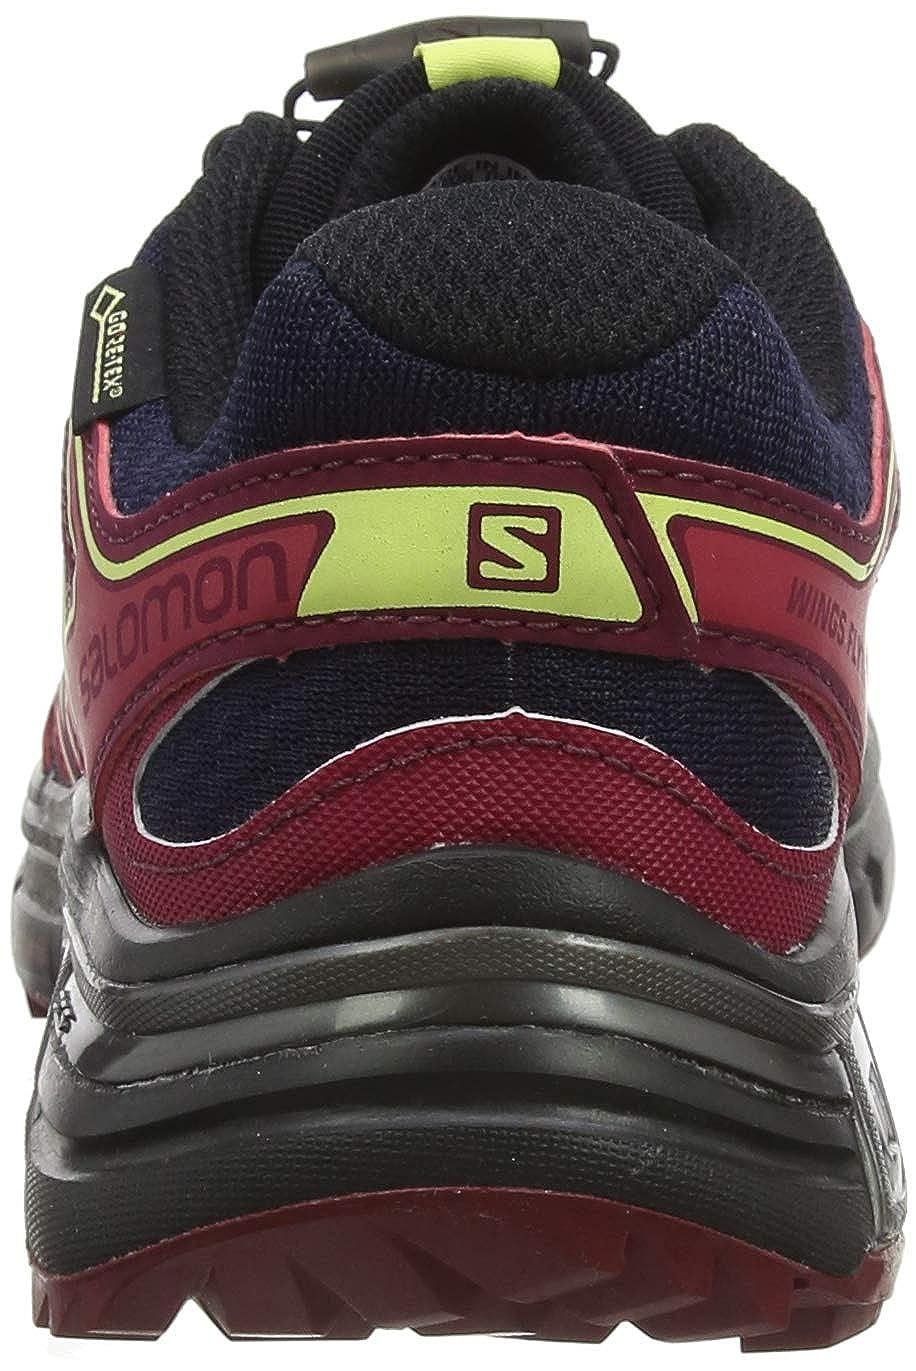 Salomon Damen Wings Flyte 2 GTX Trailrunning-Schuhe